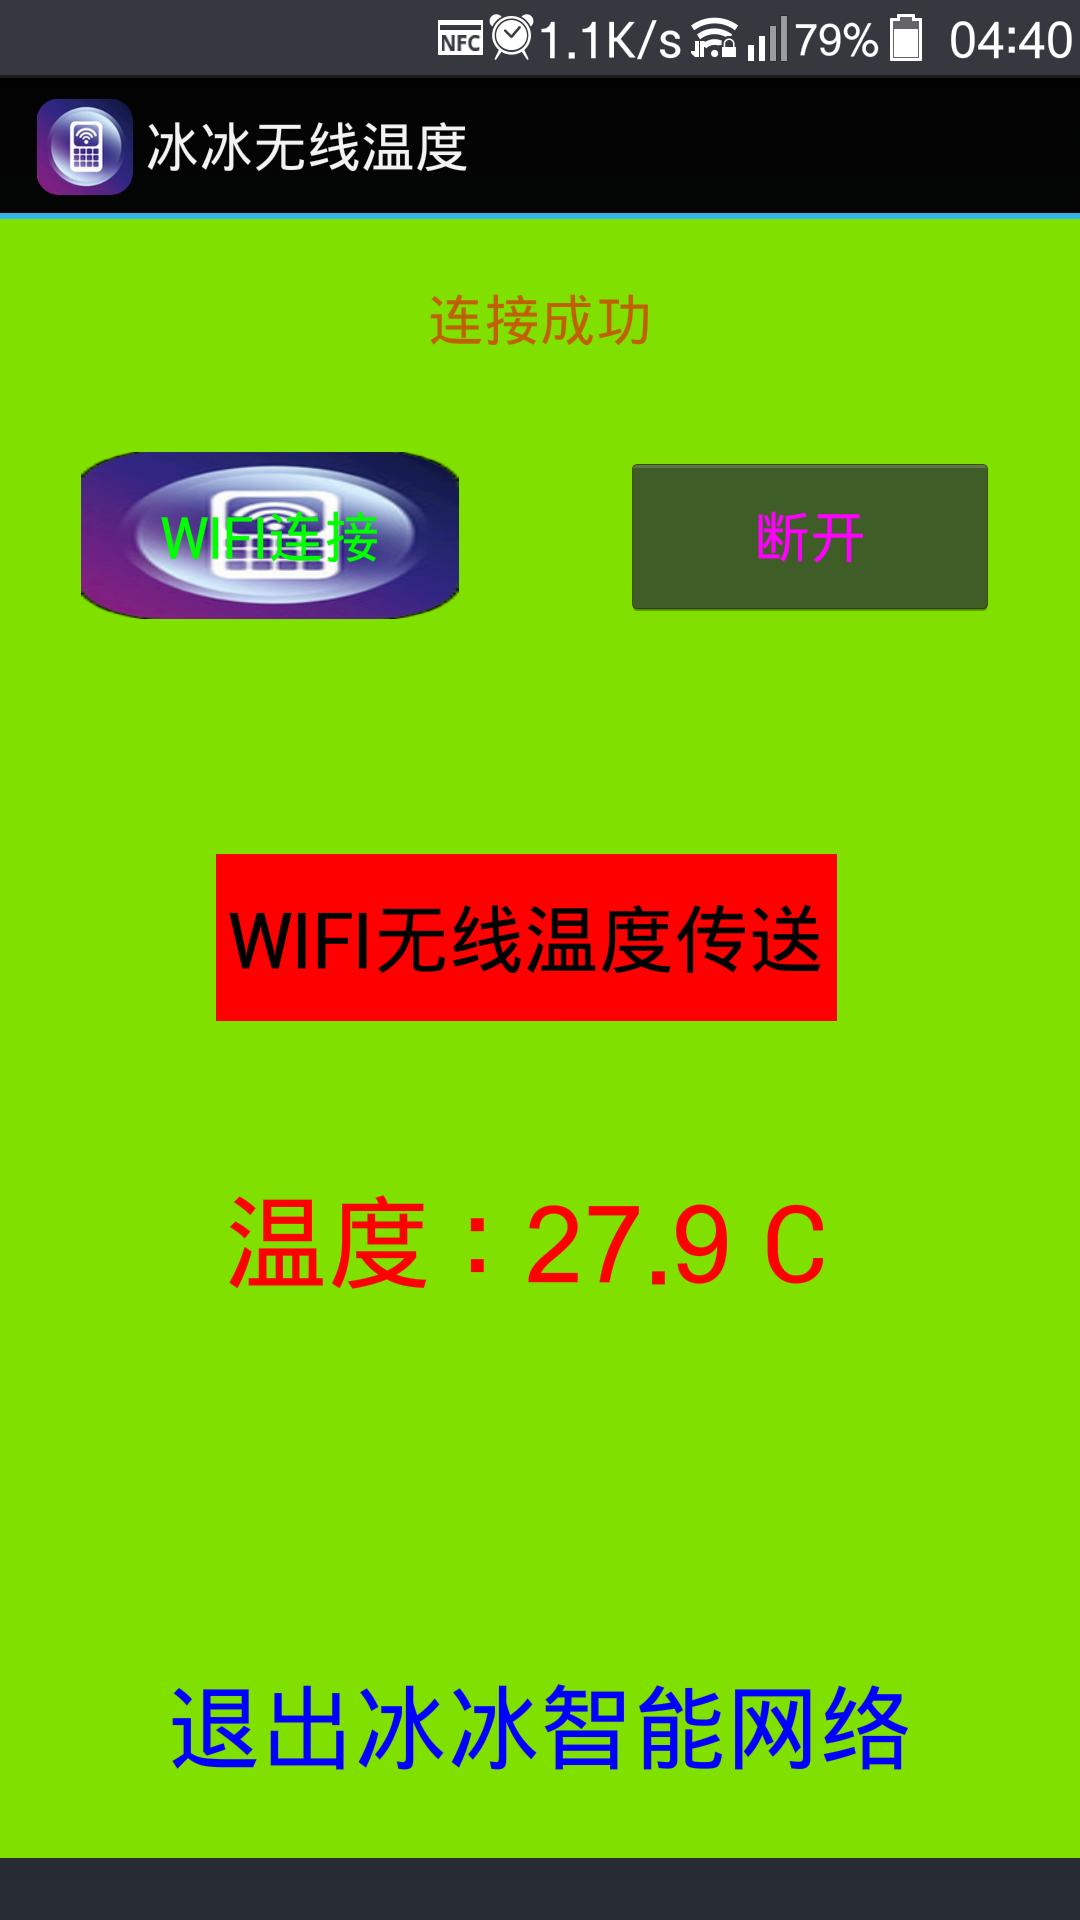 Screenshot_2018-12-28-04-40-57.png